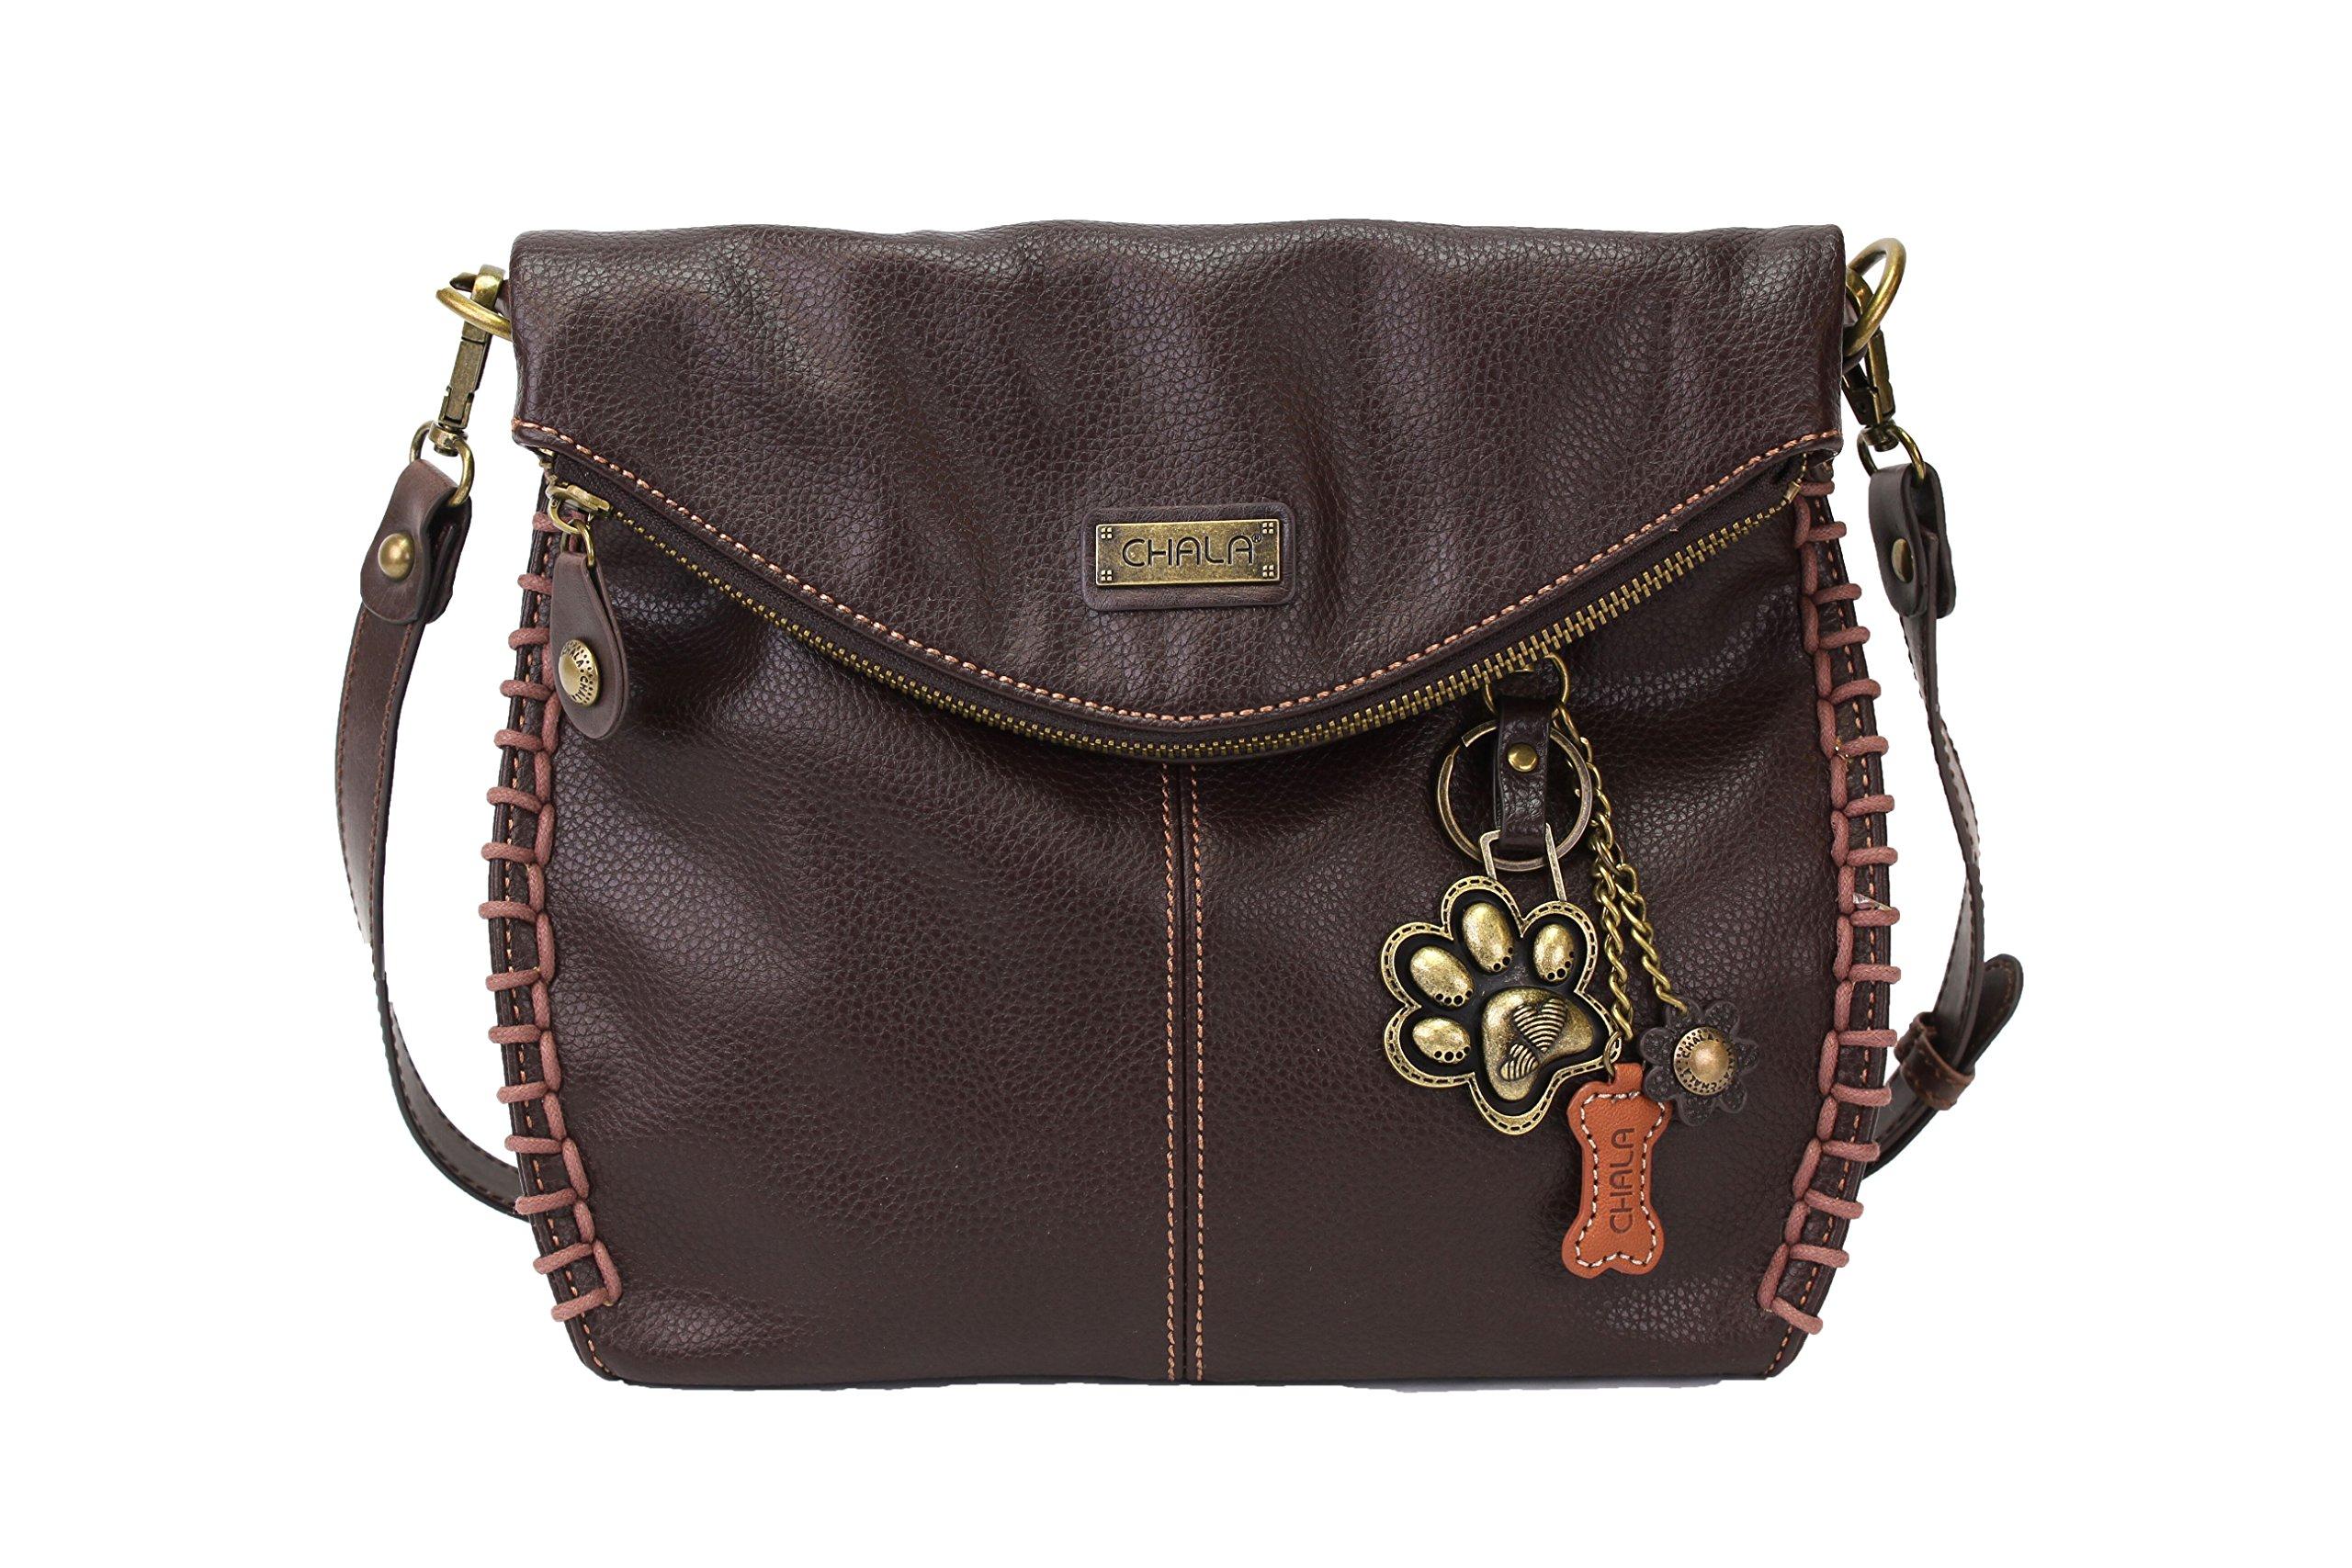 Chala Charming Crossbody Bag with Zipper Flap Top and Metal Chain - Dark Brown - Paw Print